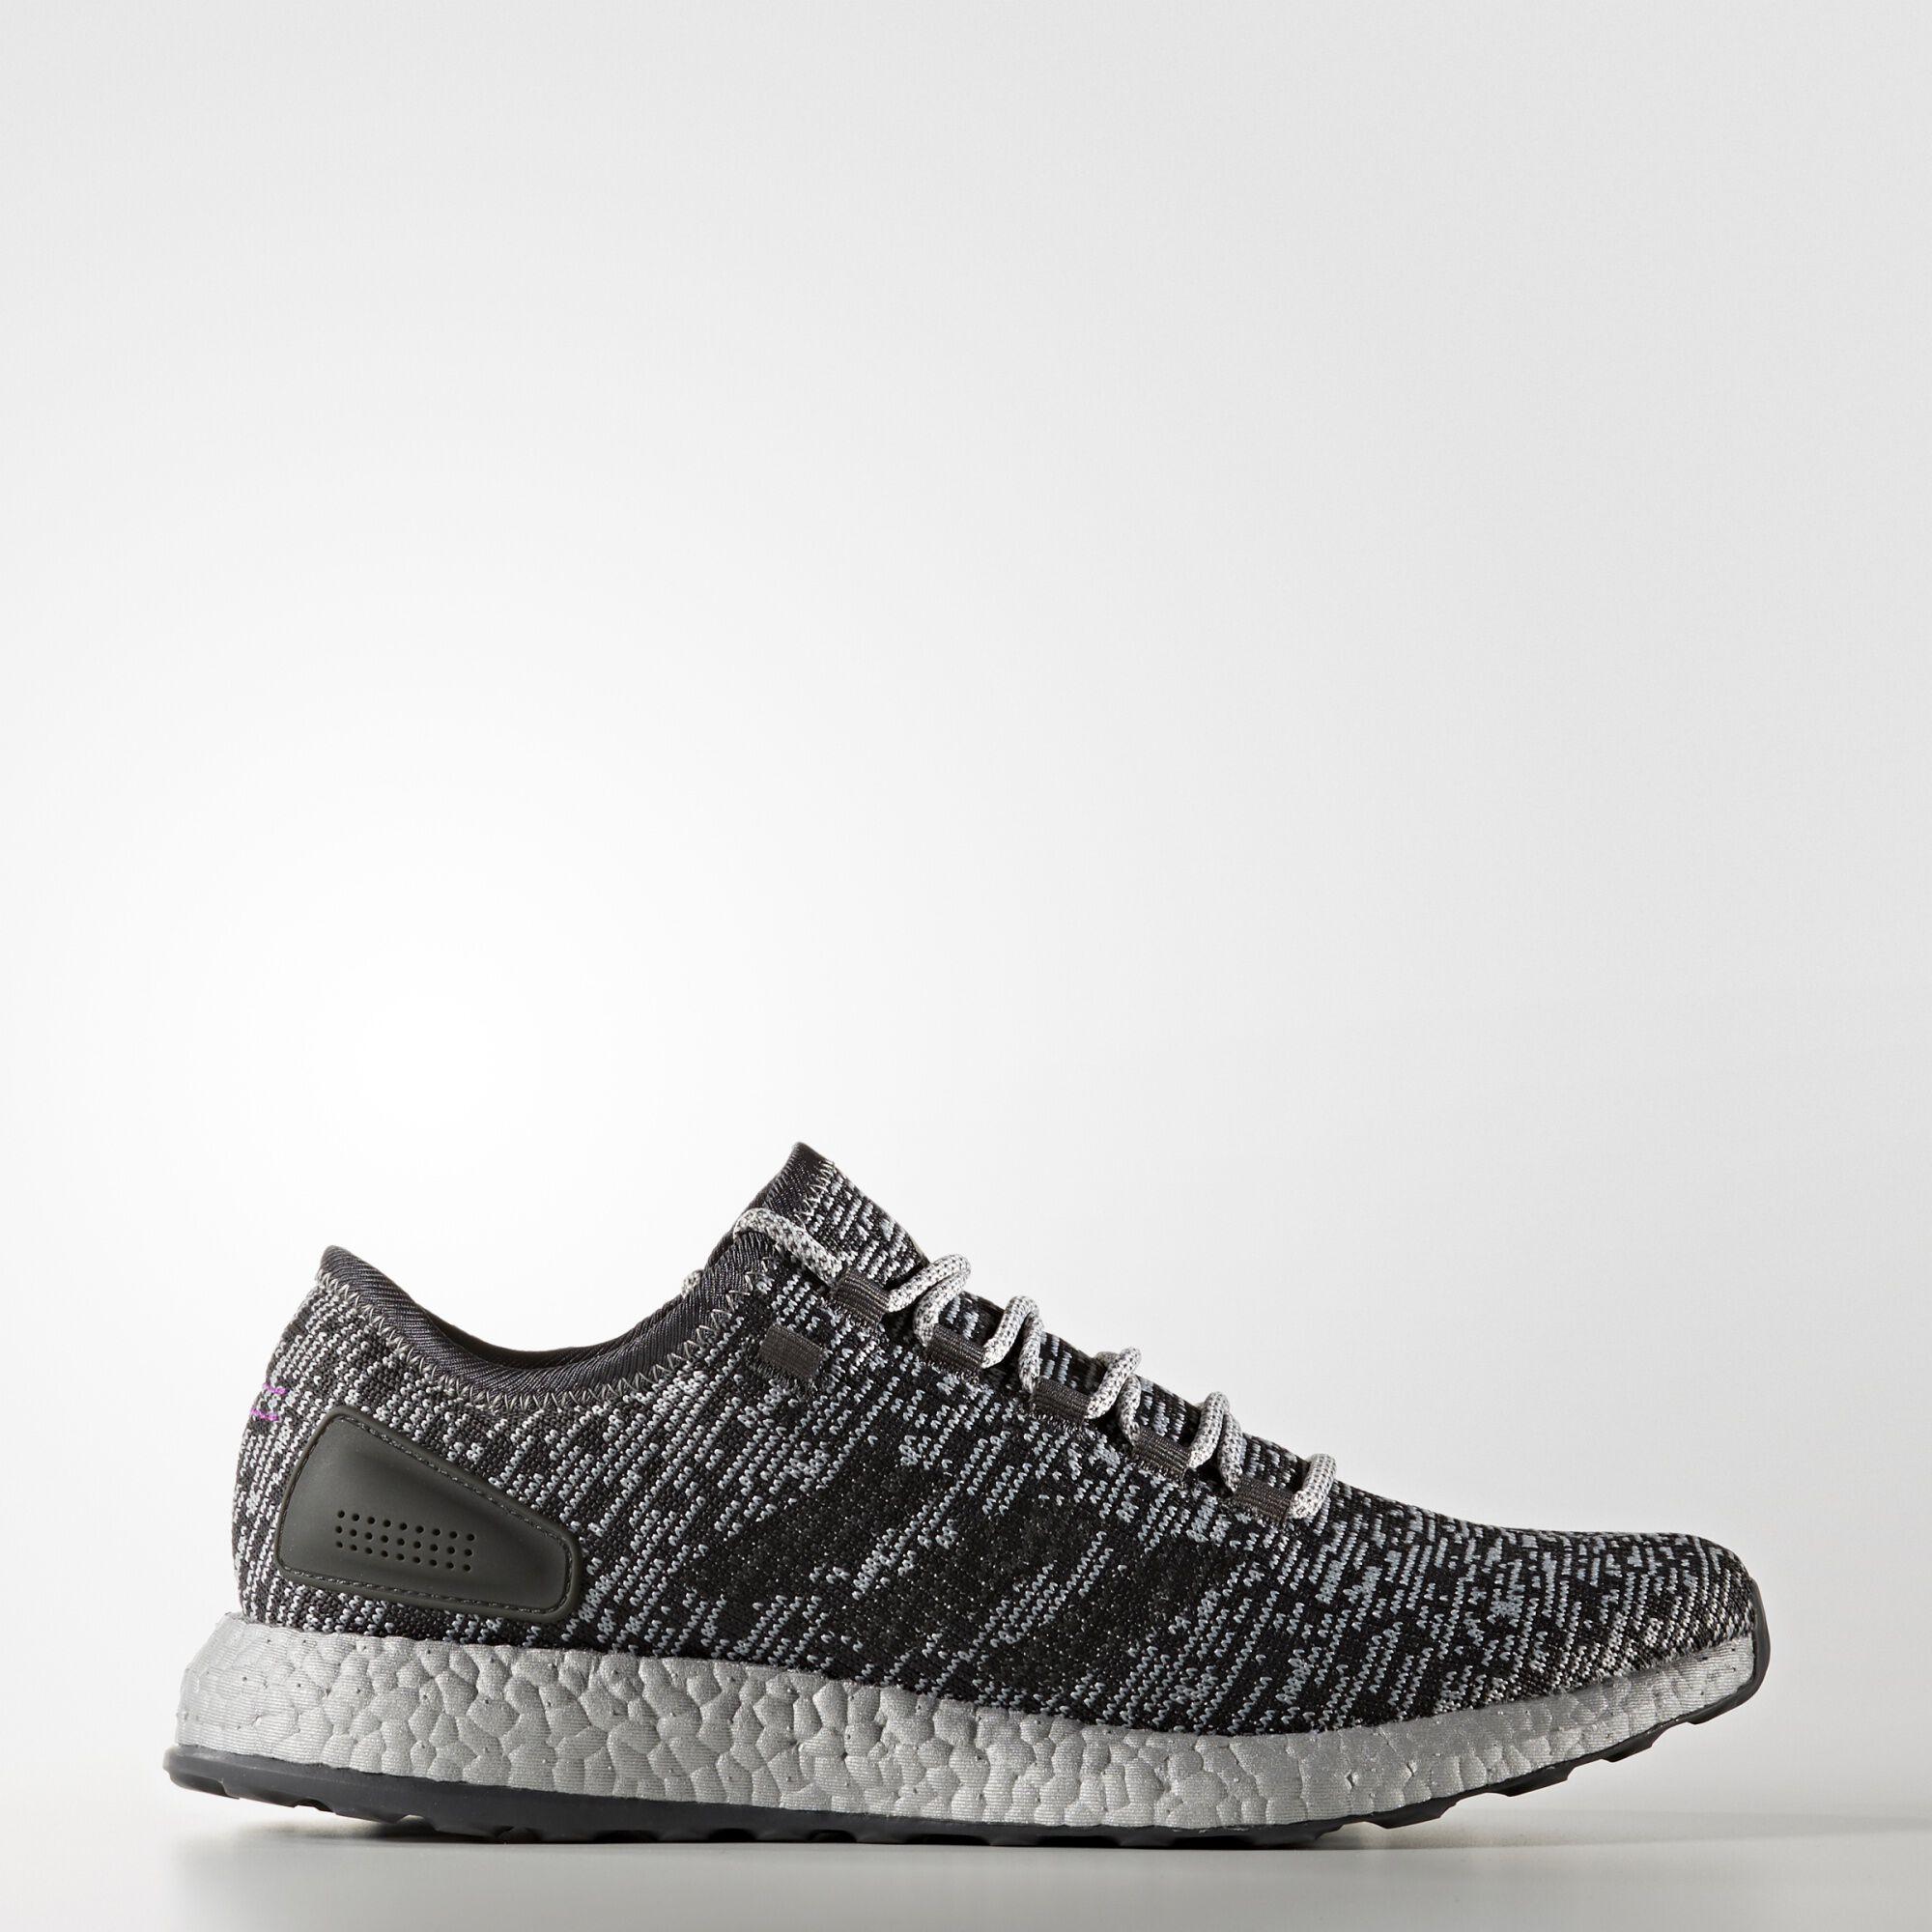 Men S Adidas Pureboost Running Shoes Untied